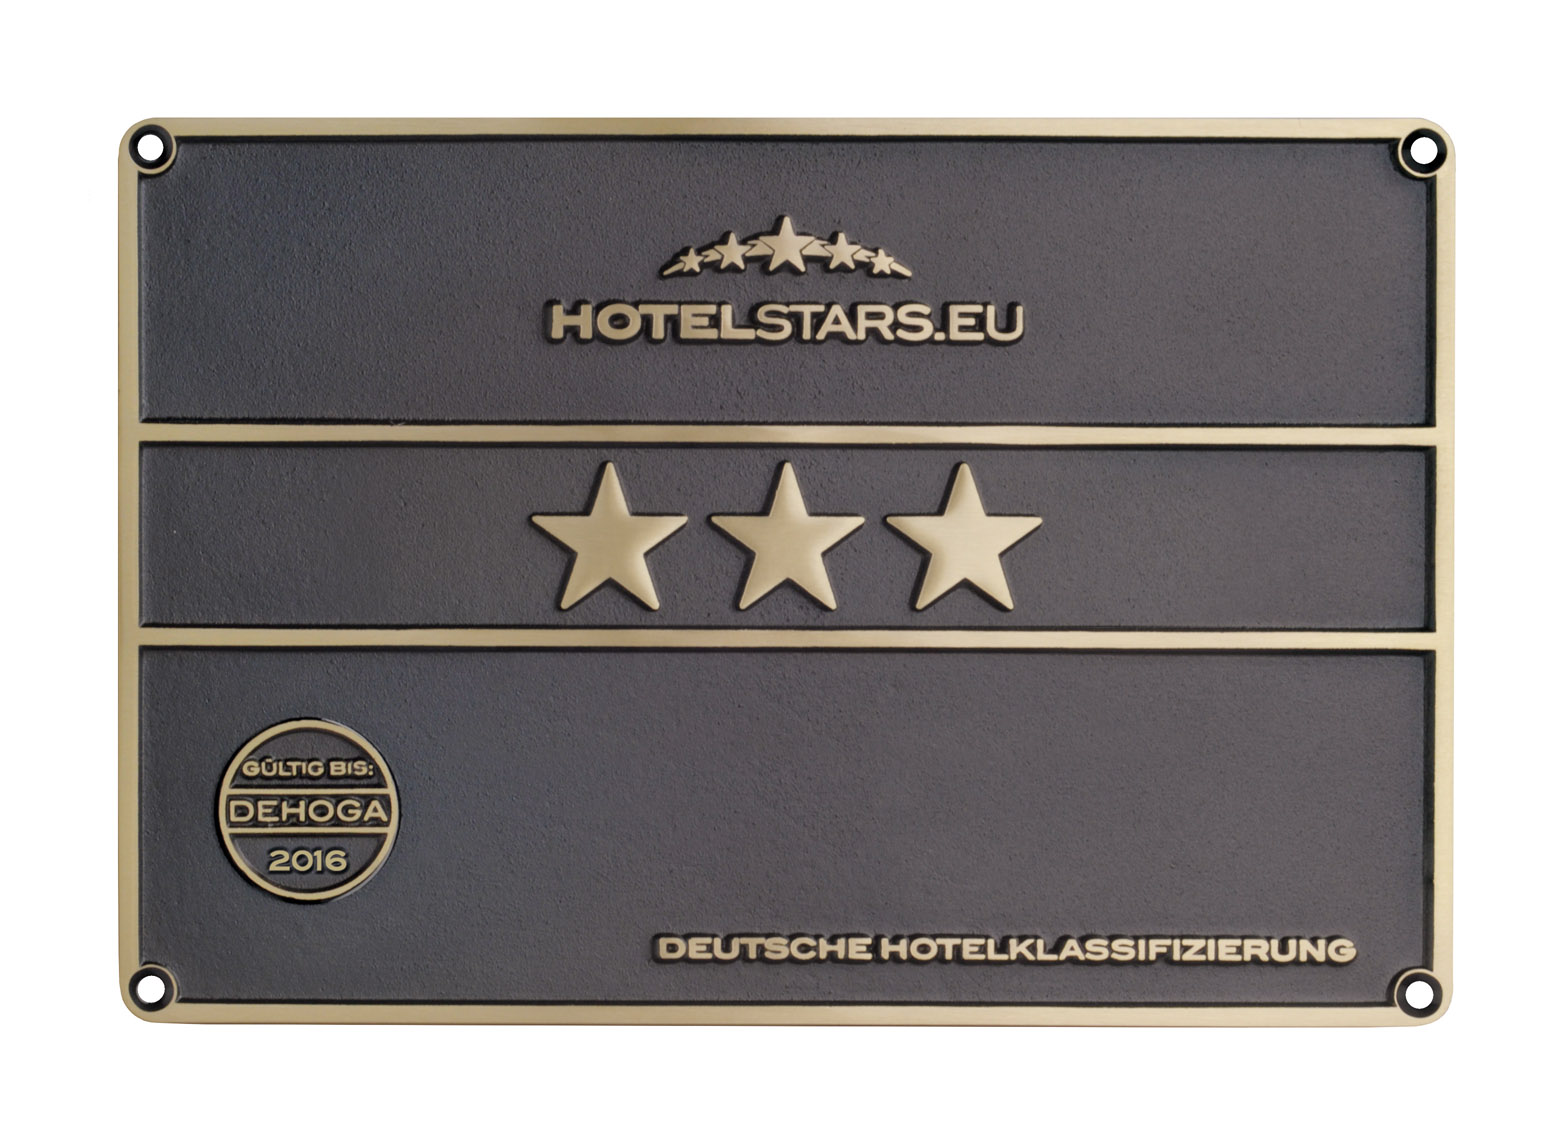 Strandhotel - Hotel Seestern Timmendorfer Strand